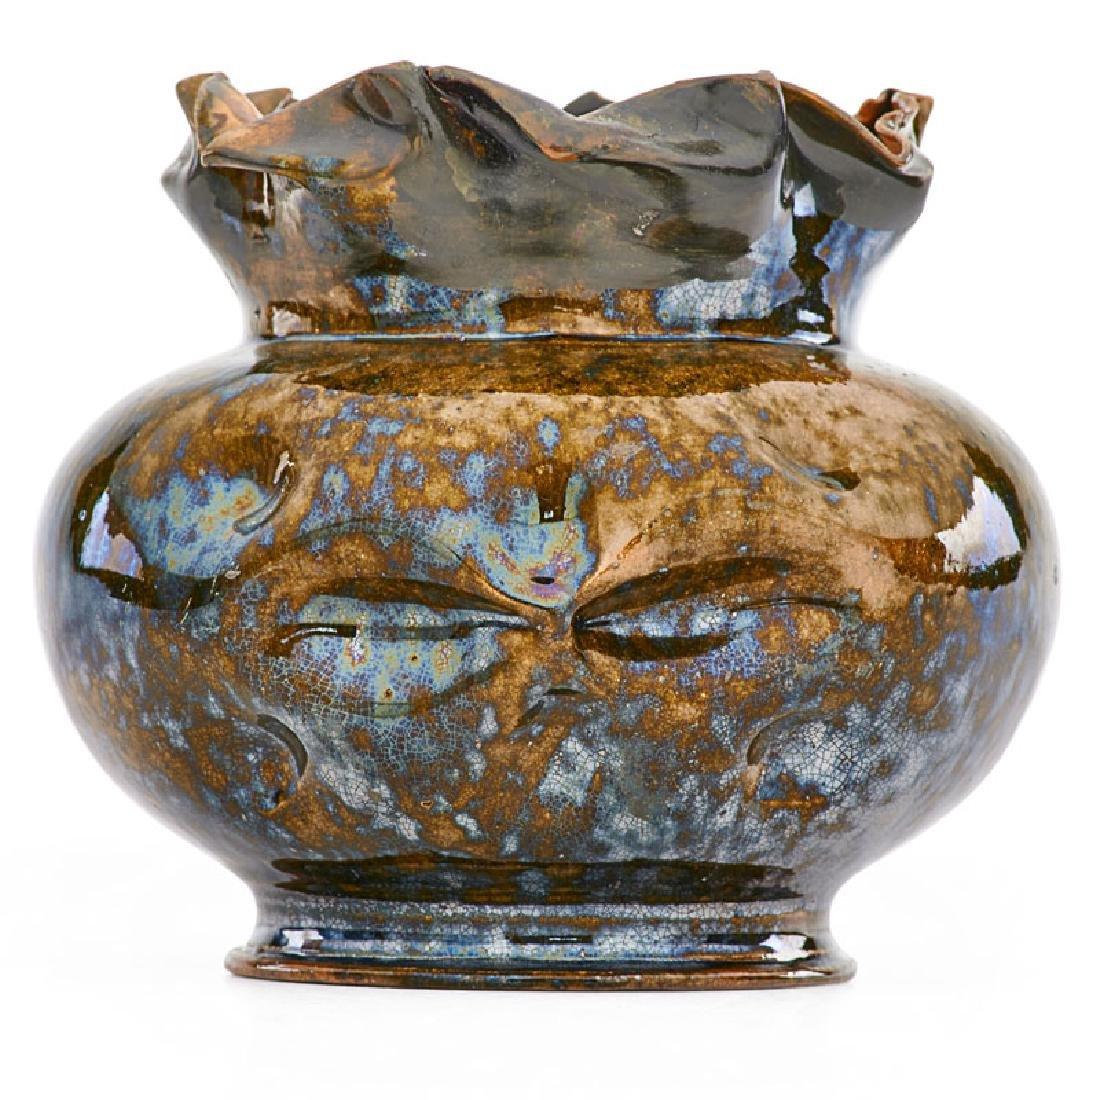 GEORGE OHR Large face vase with ruffled rim